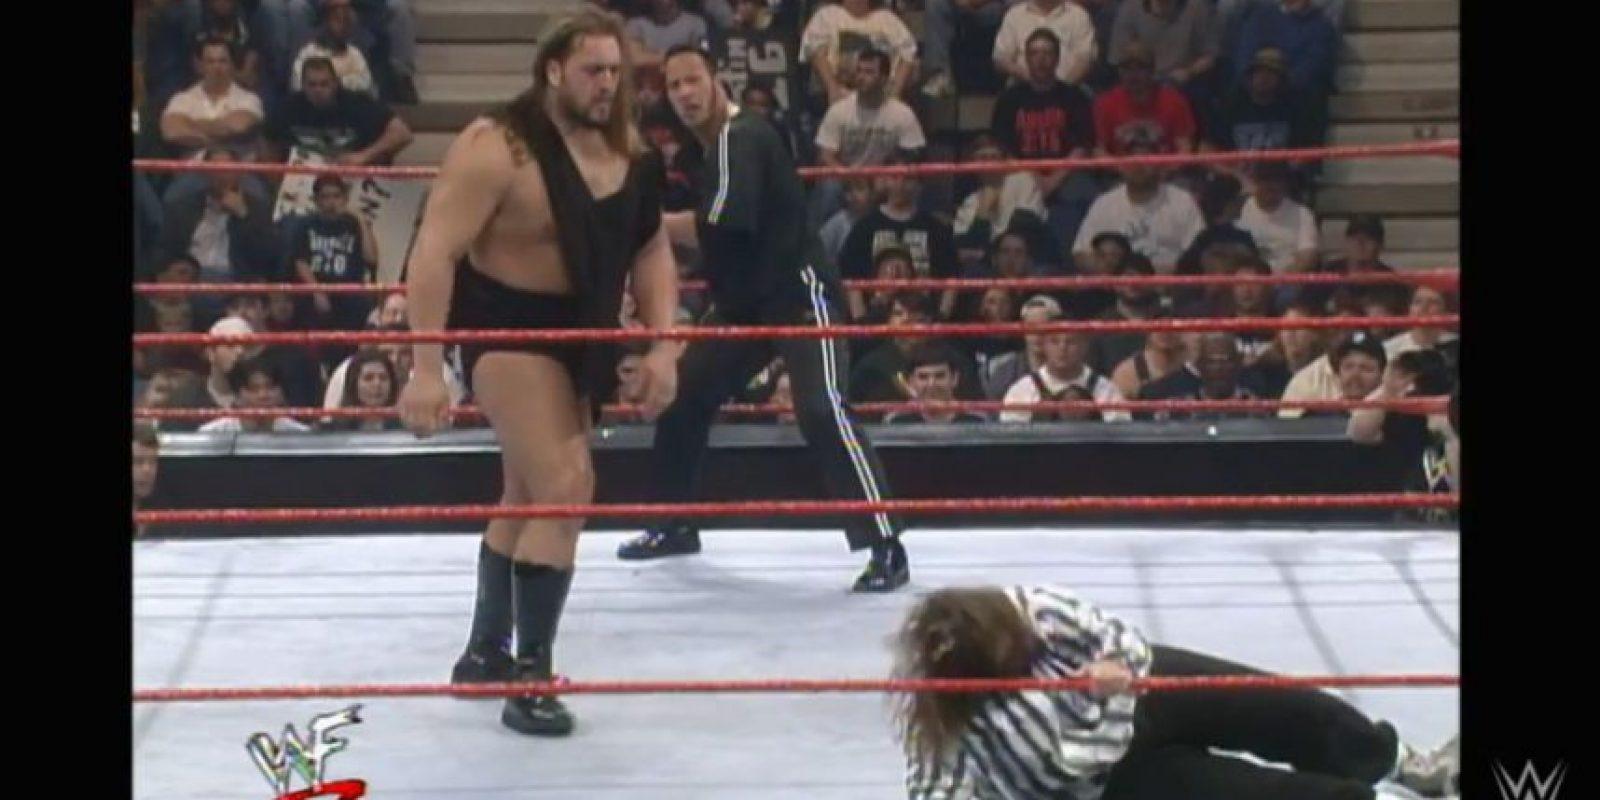 Agredió a Mankind, el 16 de febrero de 1999 Foto:WWE